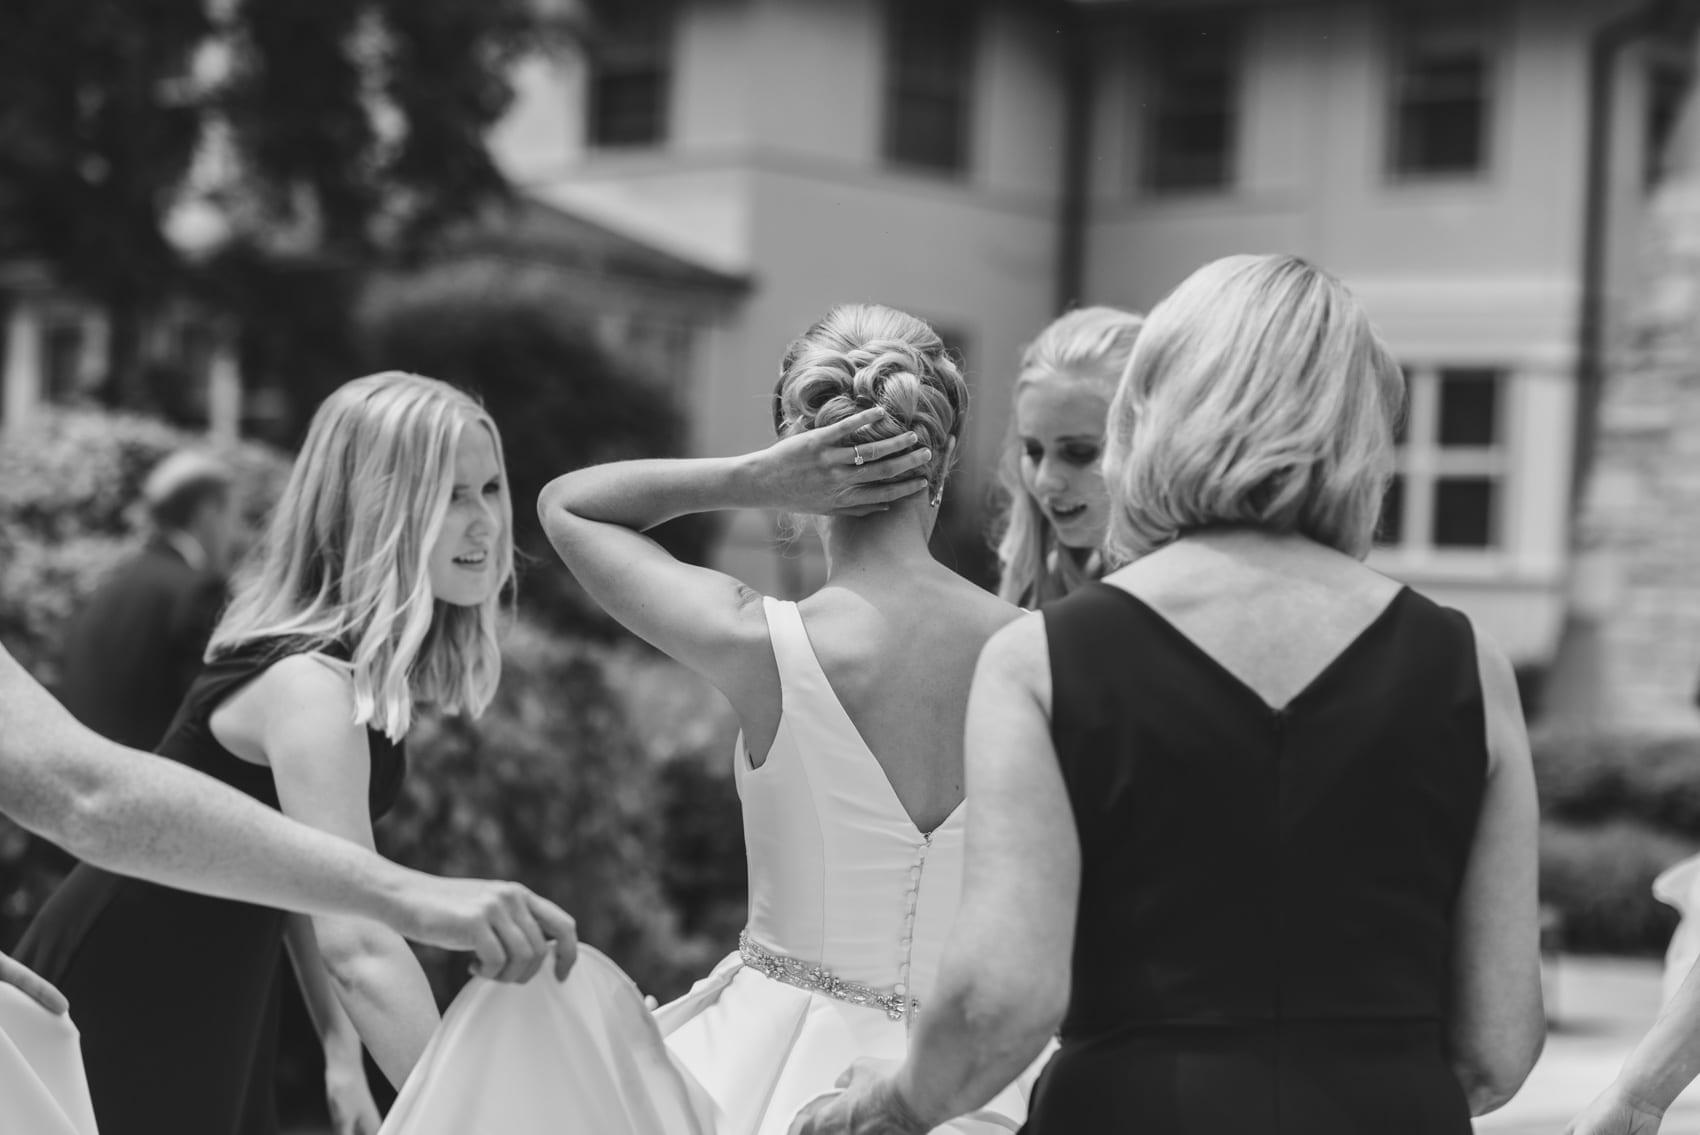 Thara Photo Chicago Wedding Photographer Engagement Photographer Portrait Photographer Tim Hara Glen Club Glenview Summer